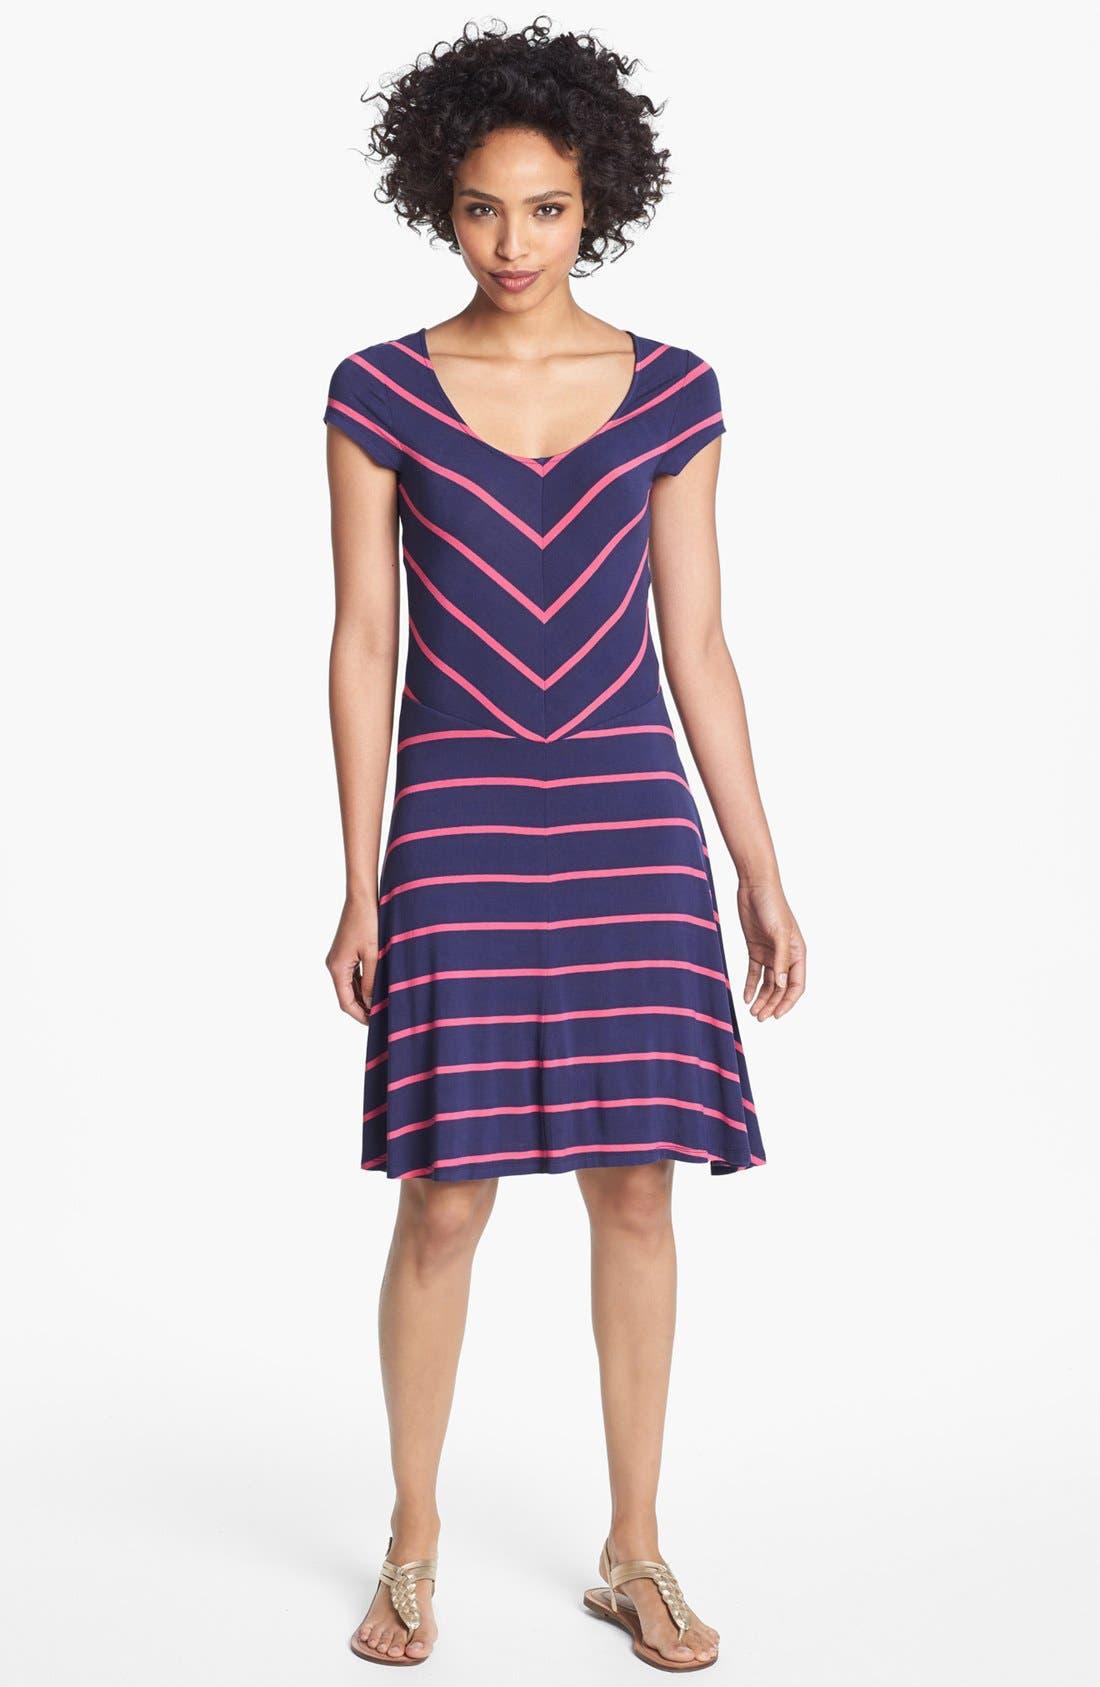 Main Image - Felicity & Coco Stripe Jersey Dress (Regular & Petite) (Nordstrom Exclusive)